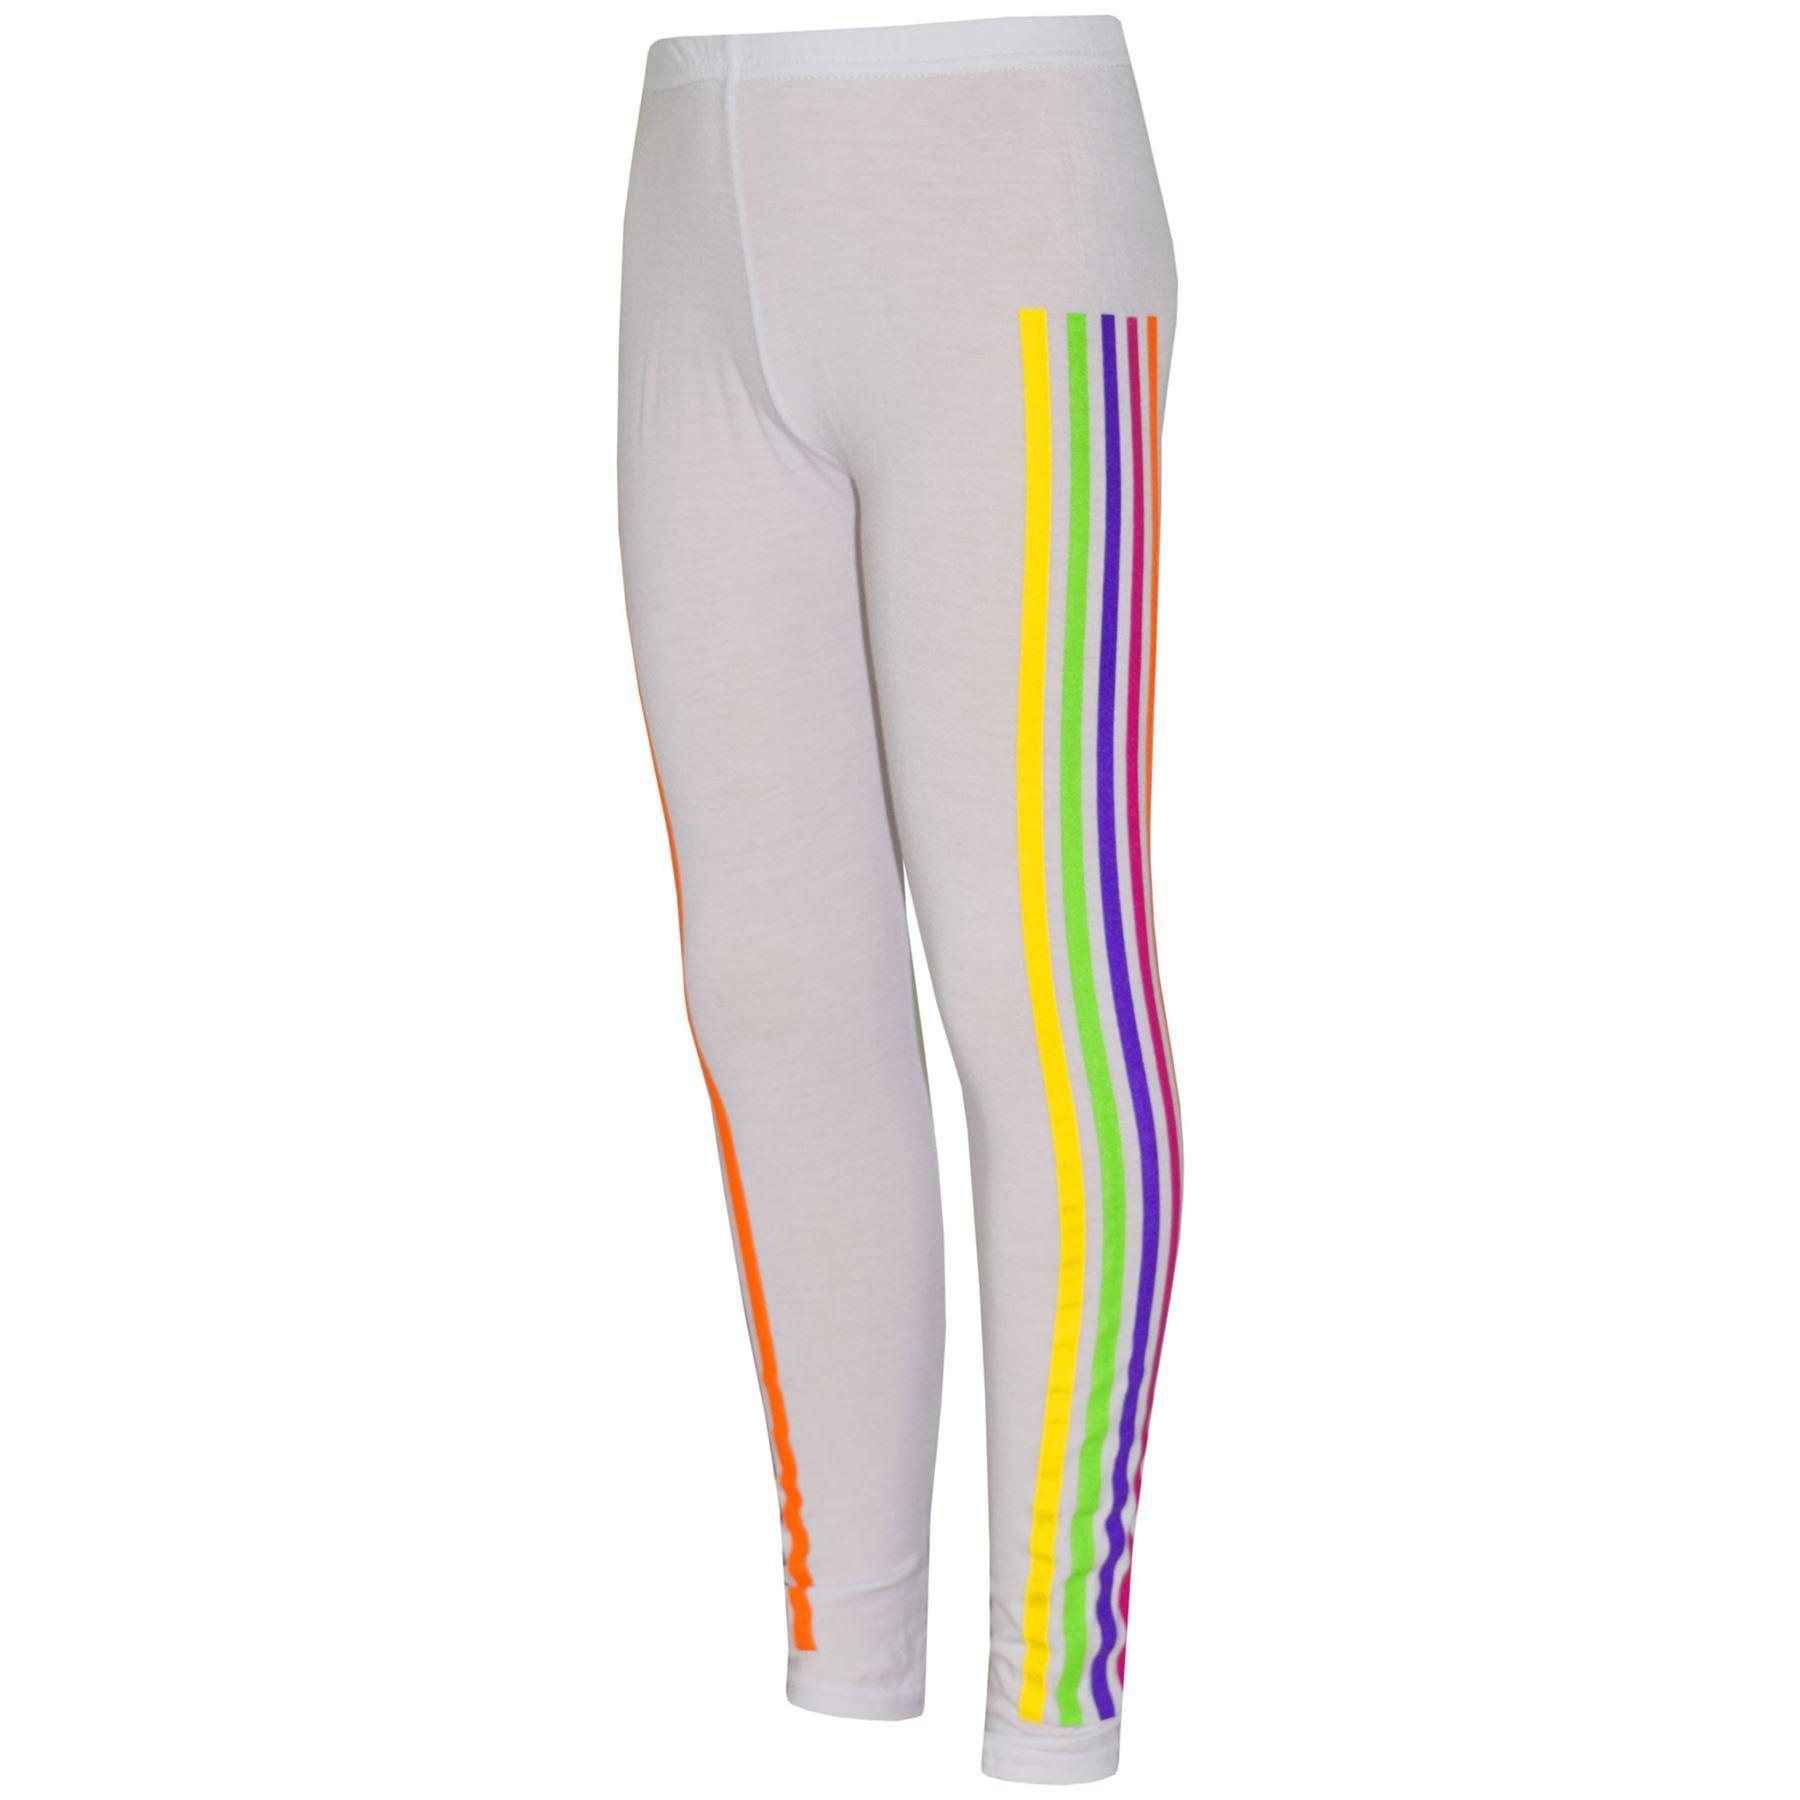 Kids Girls Rainbow Unicorn Dab Floss White Top /& Legging Outfit Set Age 7-13 Yrs